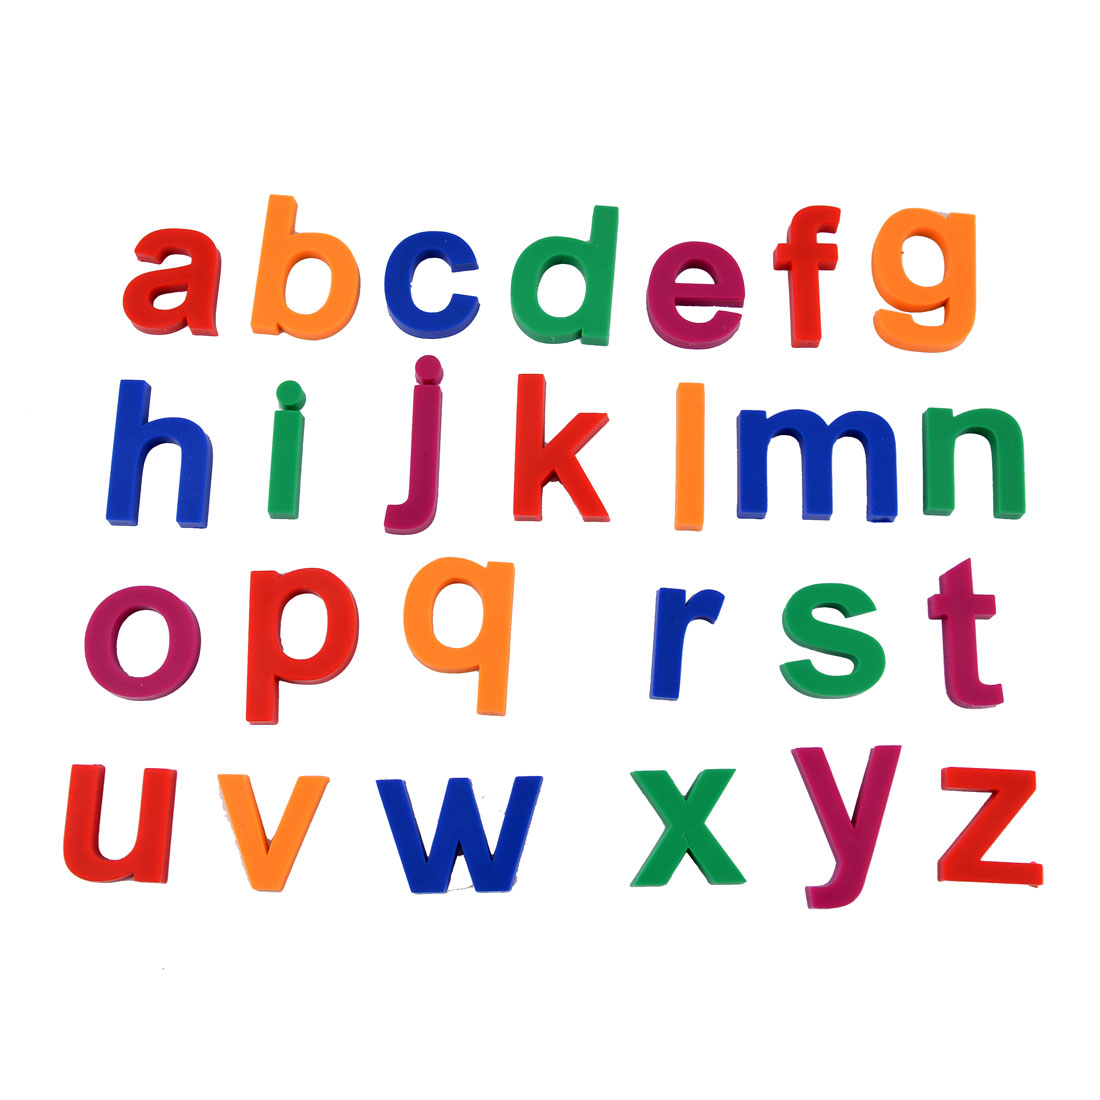 Unique bargains 26 in 1 alphabet letters design fridge refrigerator magnets walmart com